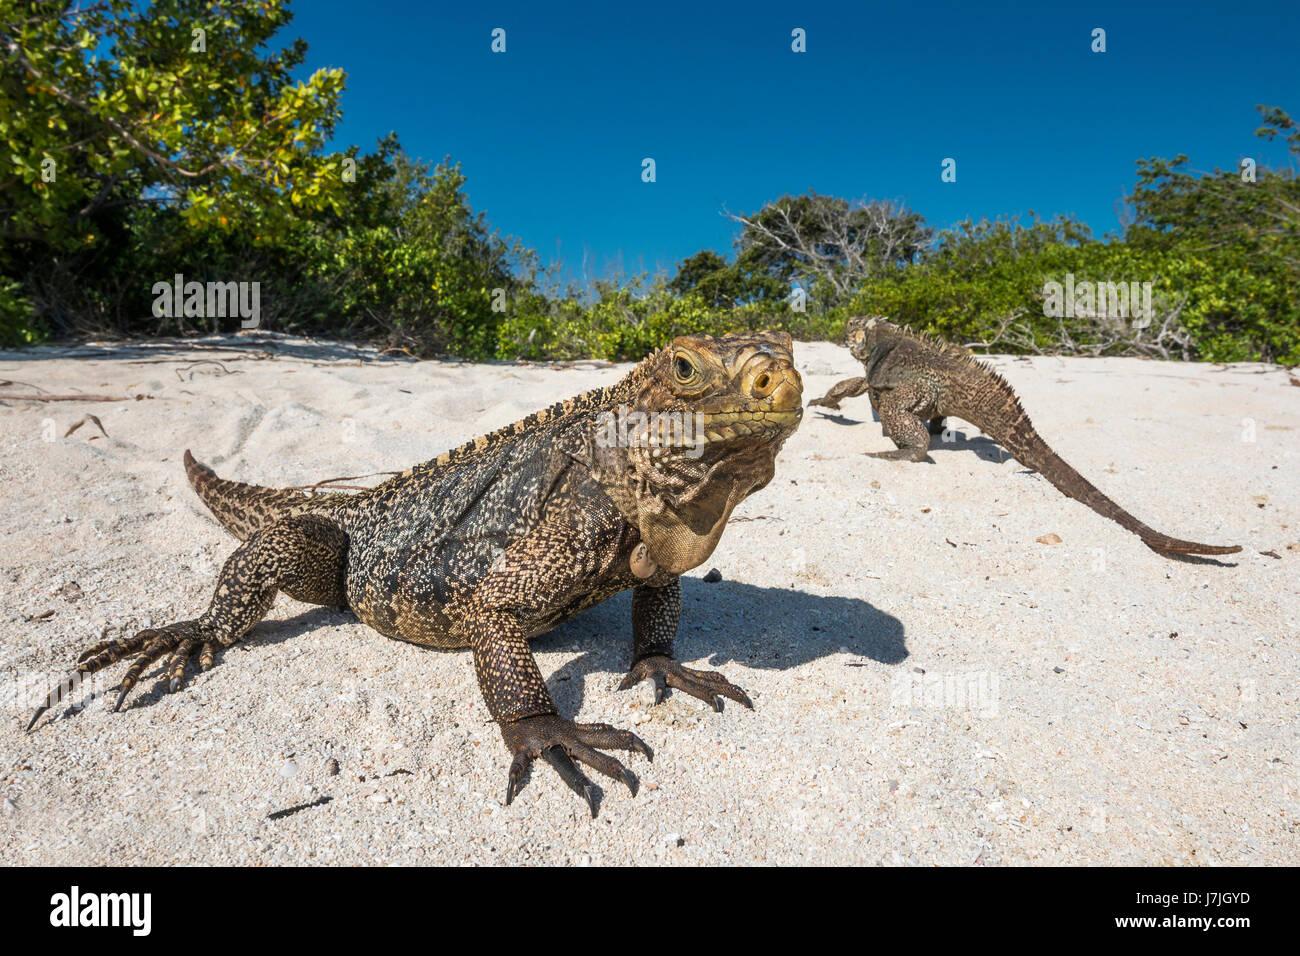 Kubanische Rock Iguana, Cyclura Nubila, Jardines De La Reina, Kuba Stockbild